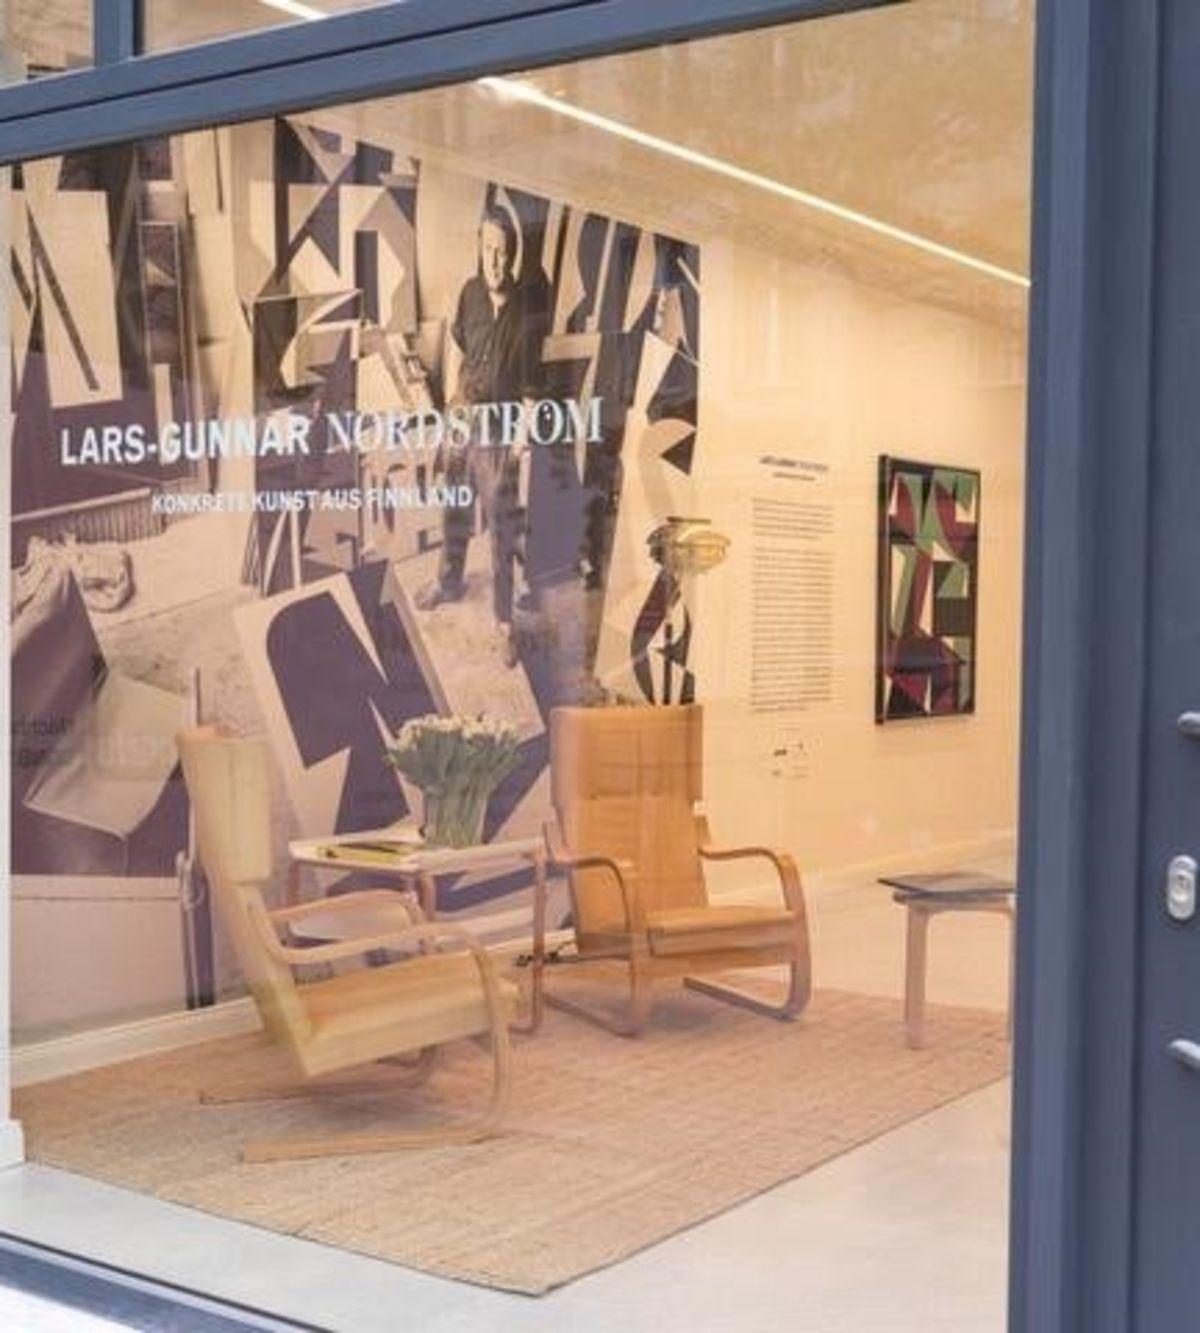 Lars-Gunnar Nordström – Finnish Concrete Art